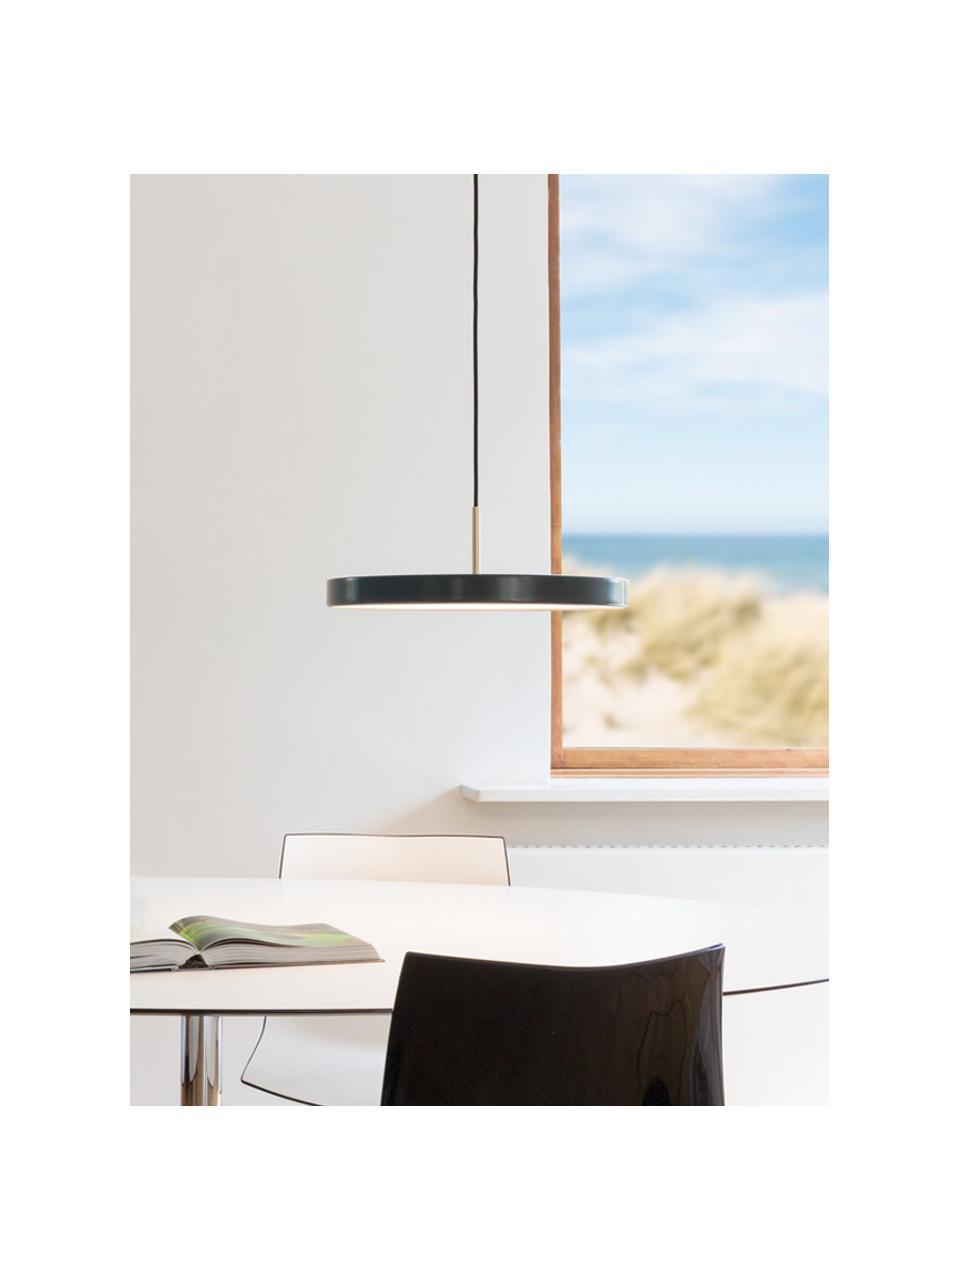 Design LED-Pendelleuchte Asteria, Lampenschirm: Aluminium, lackiert, Dekor: Stahl, lackiert, Anthrazit, Ø 31 x H 14 cm